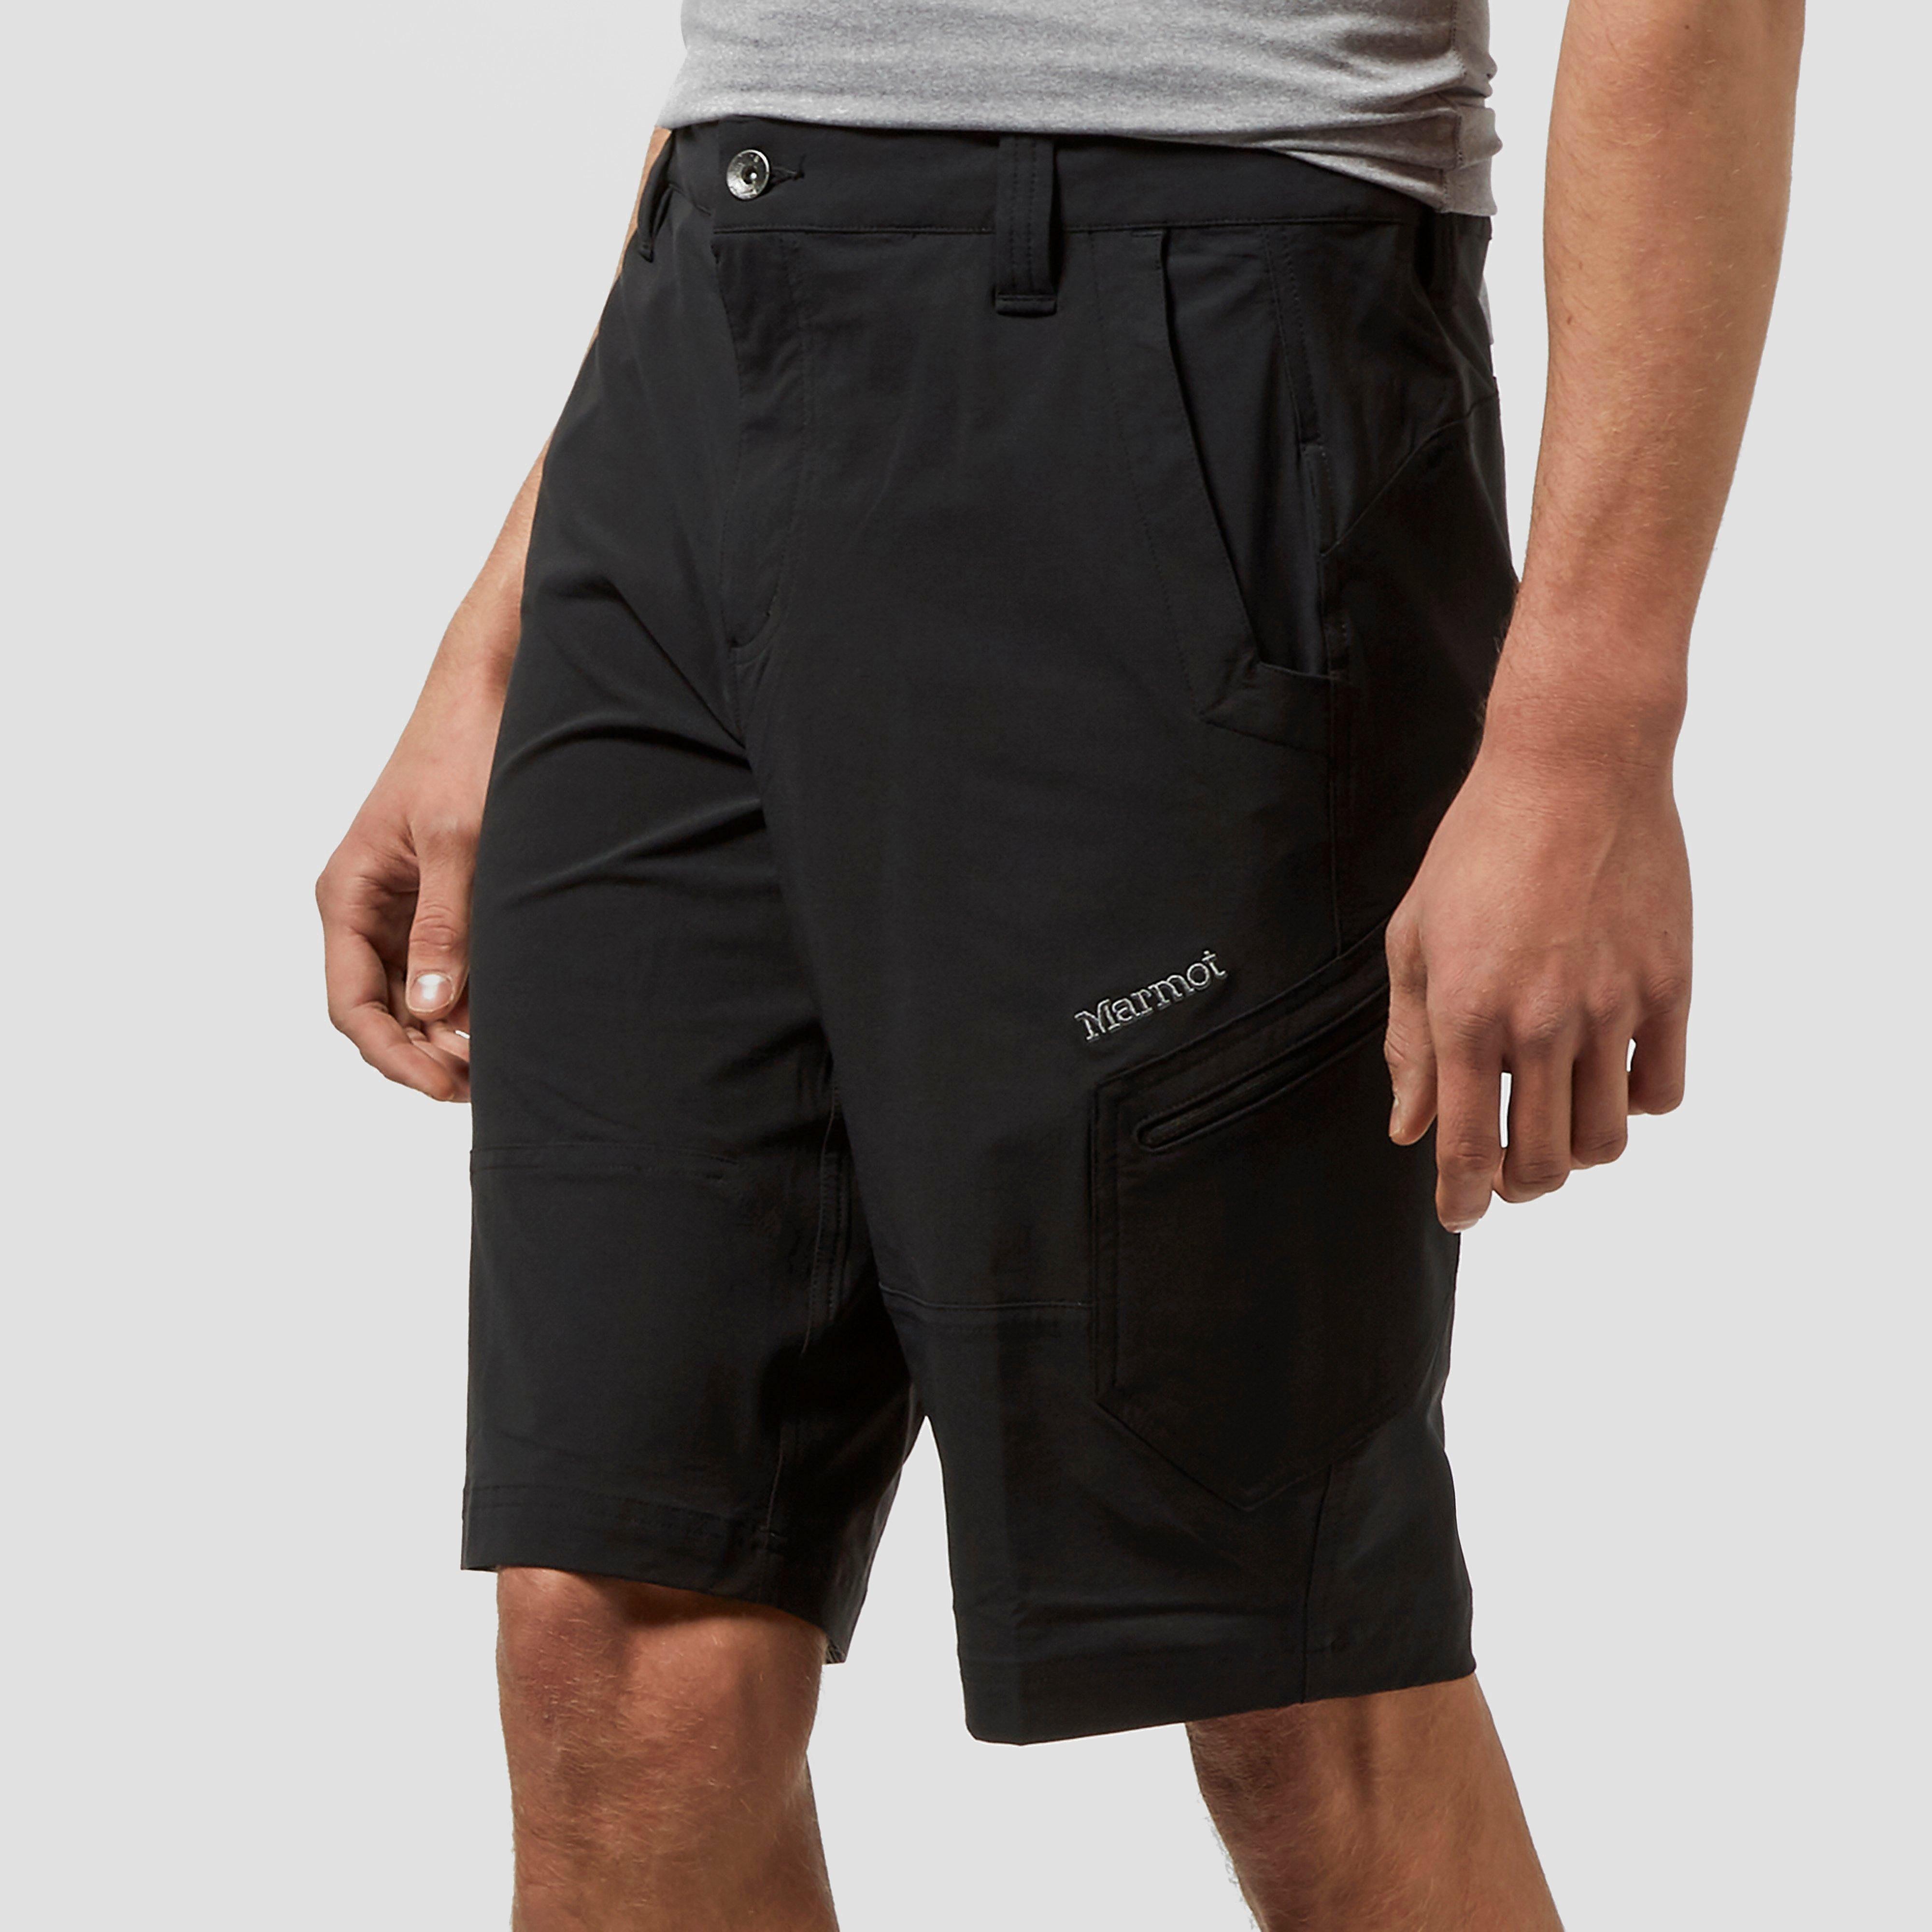 Marmot Limatour Men's Shorts